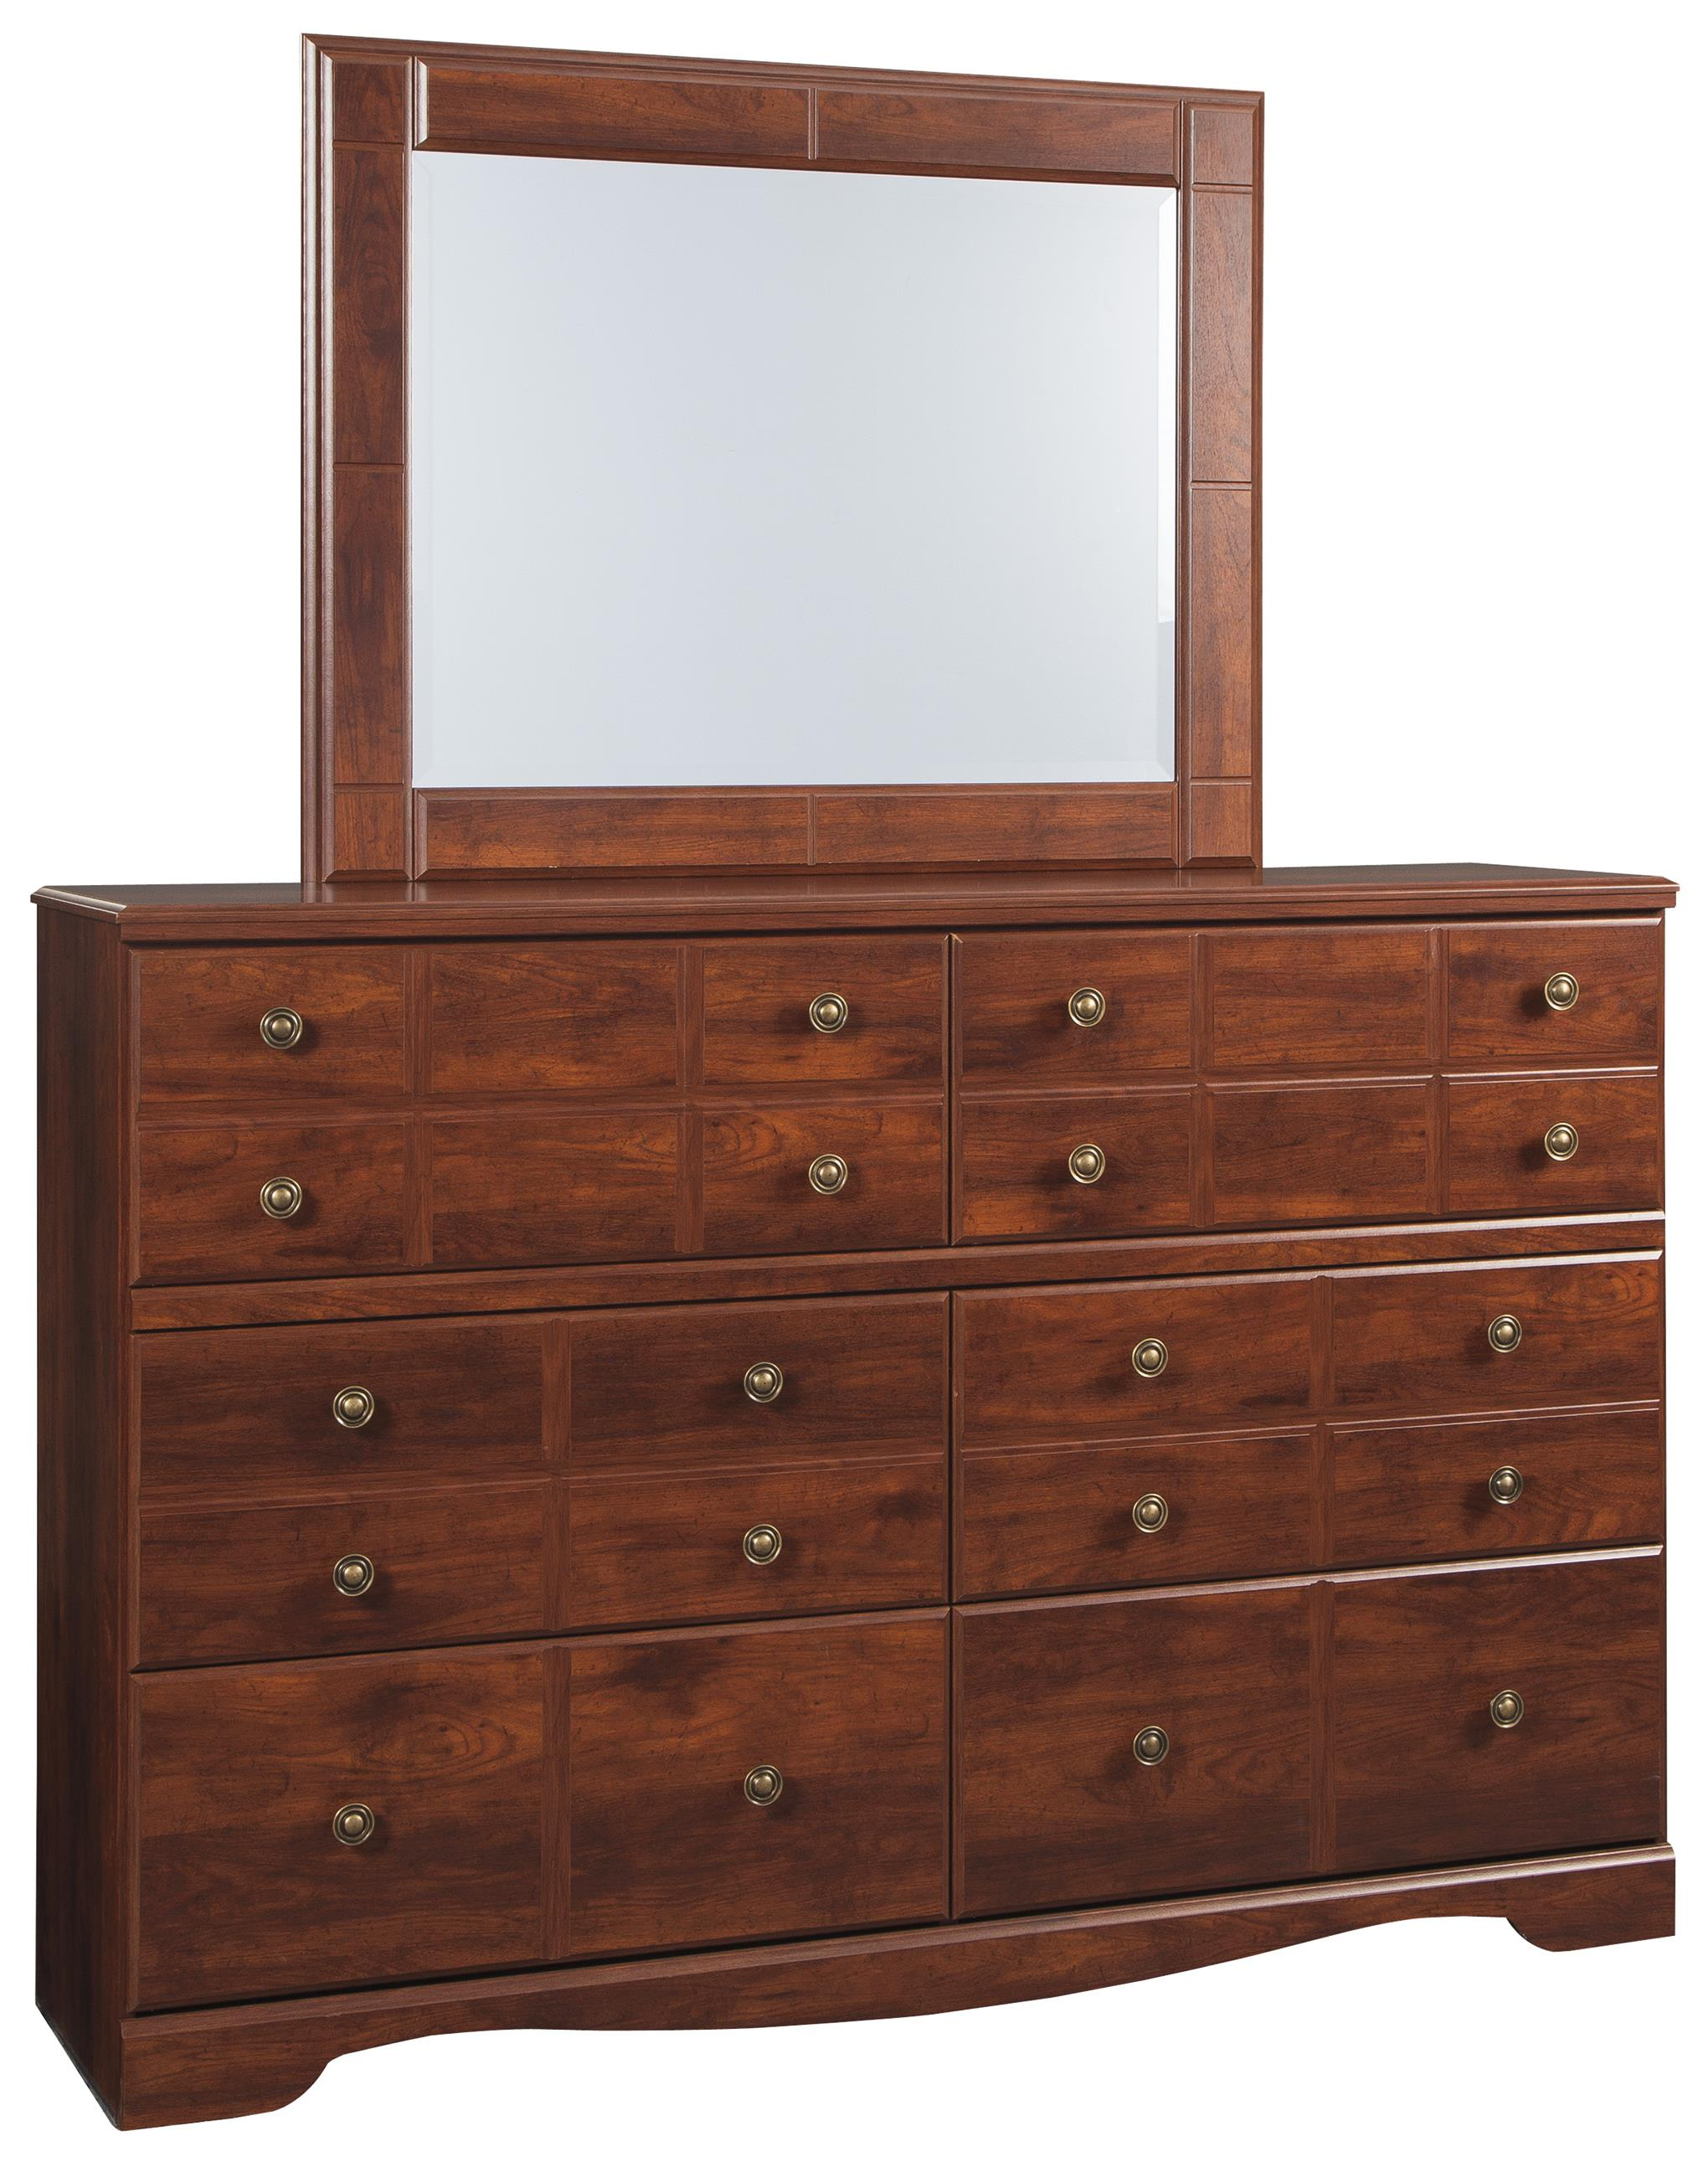 Signature Design by Ashley Brittberg Dresser & Mirror - Item Number: B265-31+36